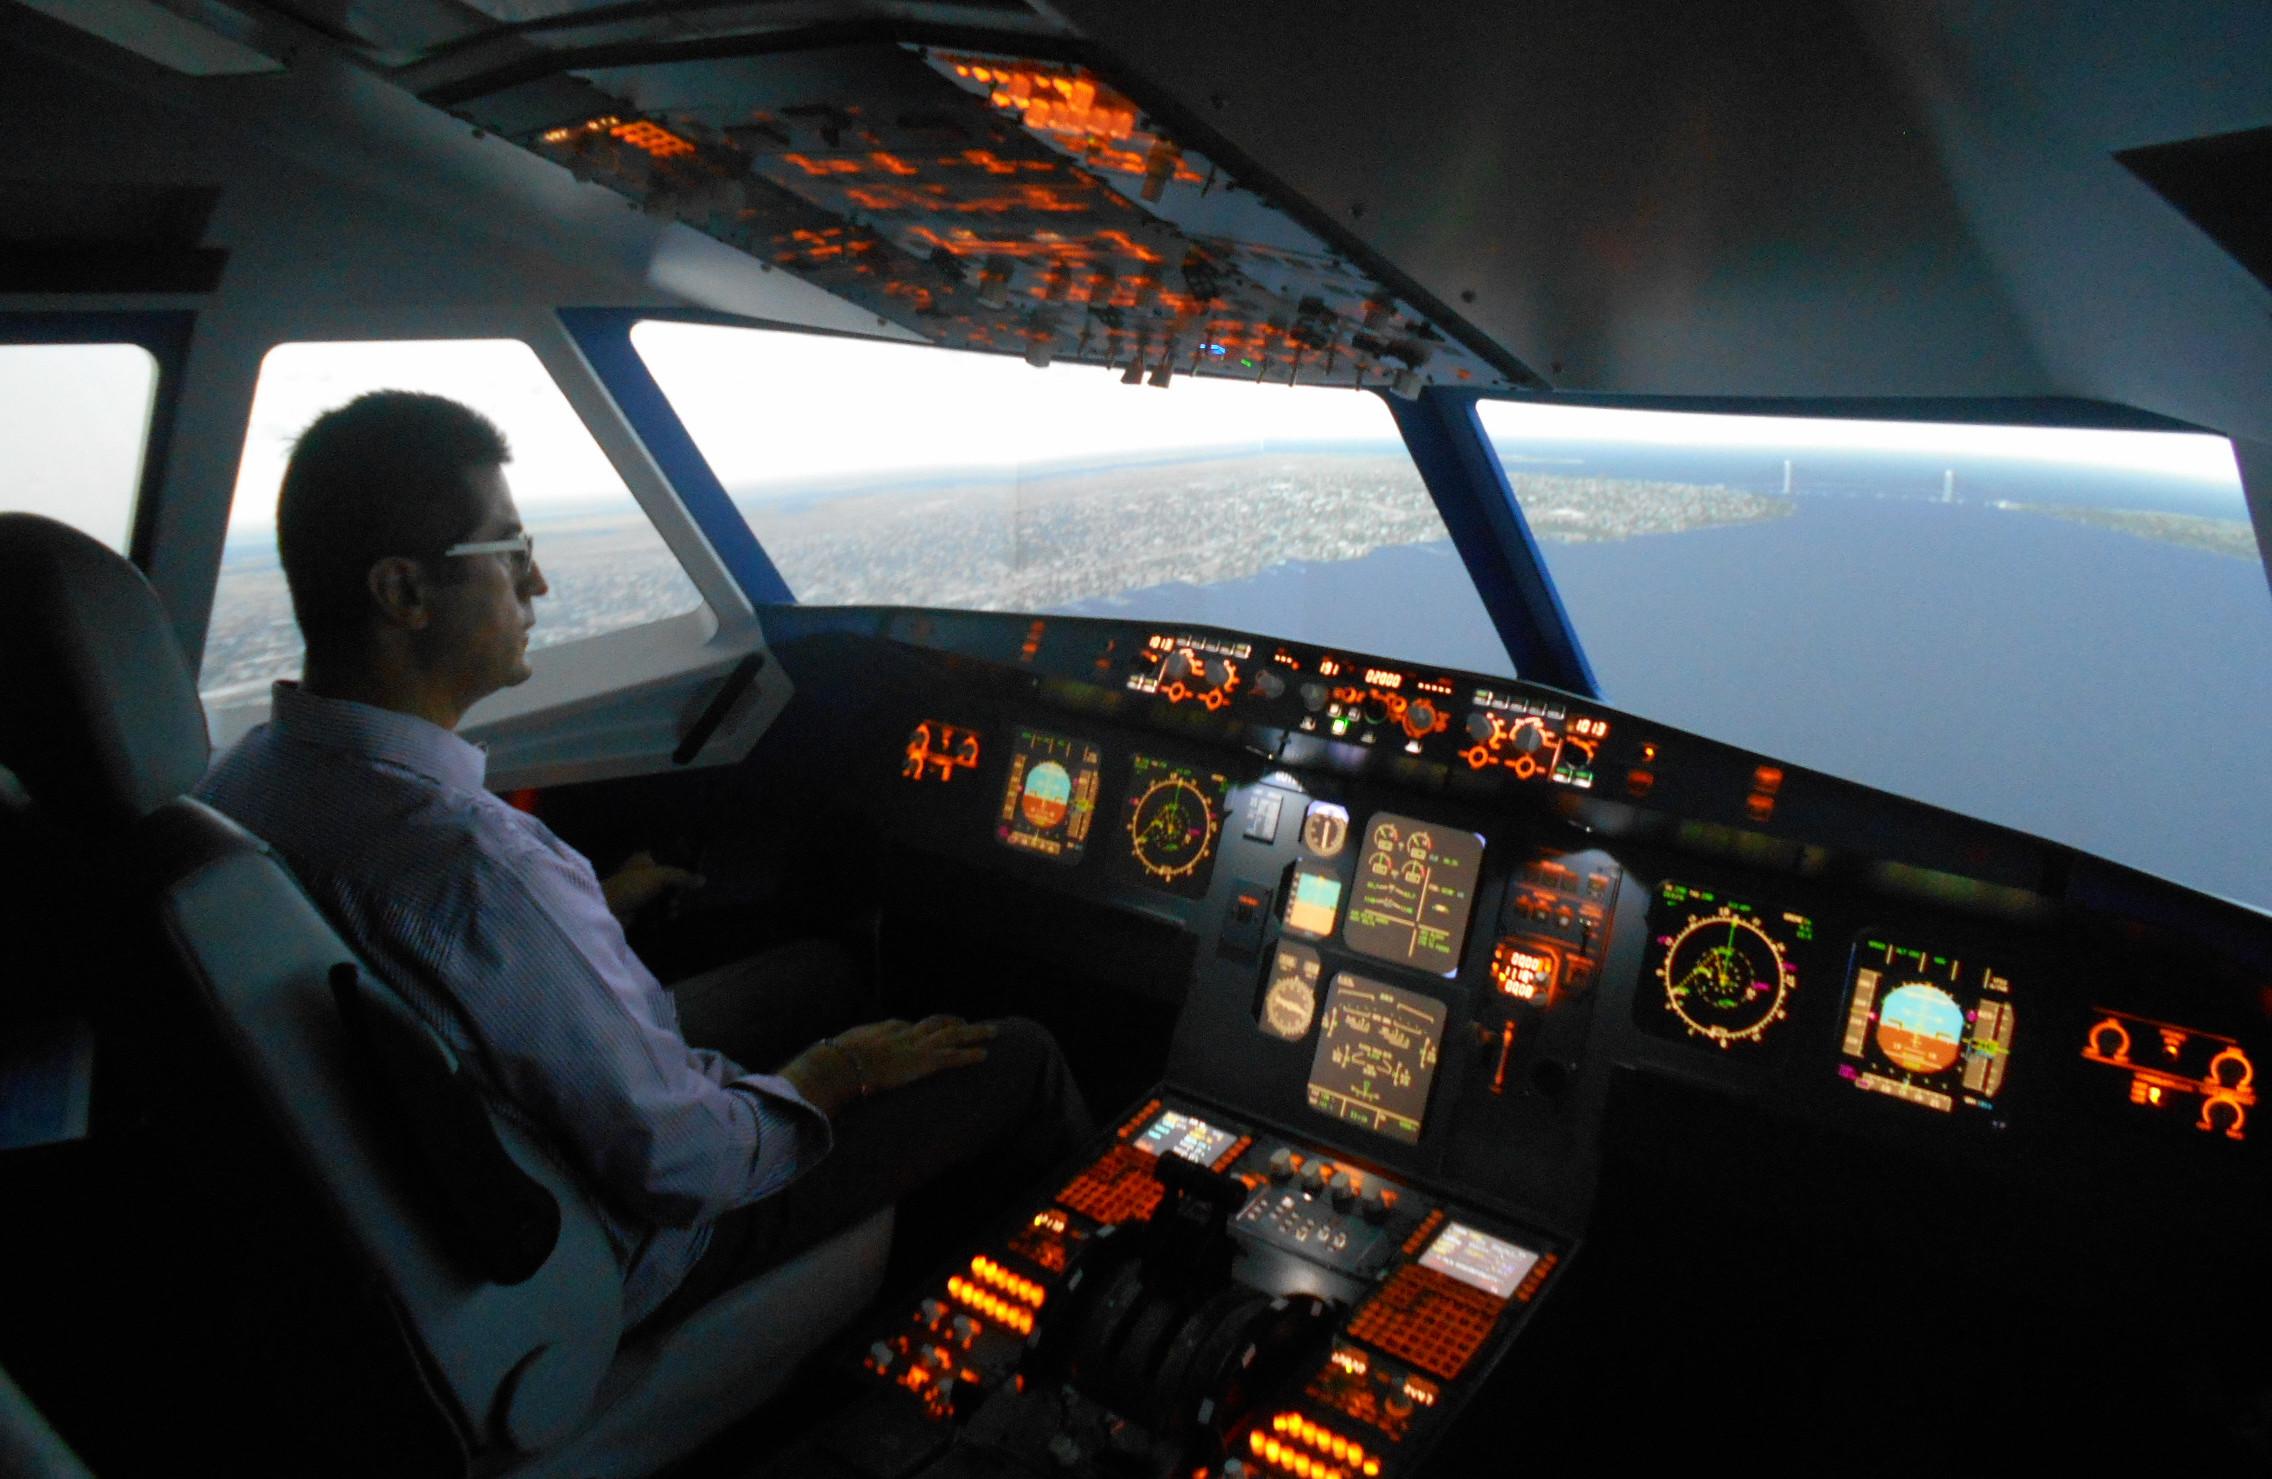 Test FCL .055 DGAC Toni Giacoia Simulateur de vol Airbus A320 anglais OACI